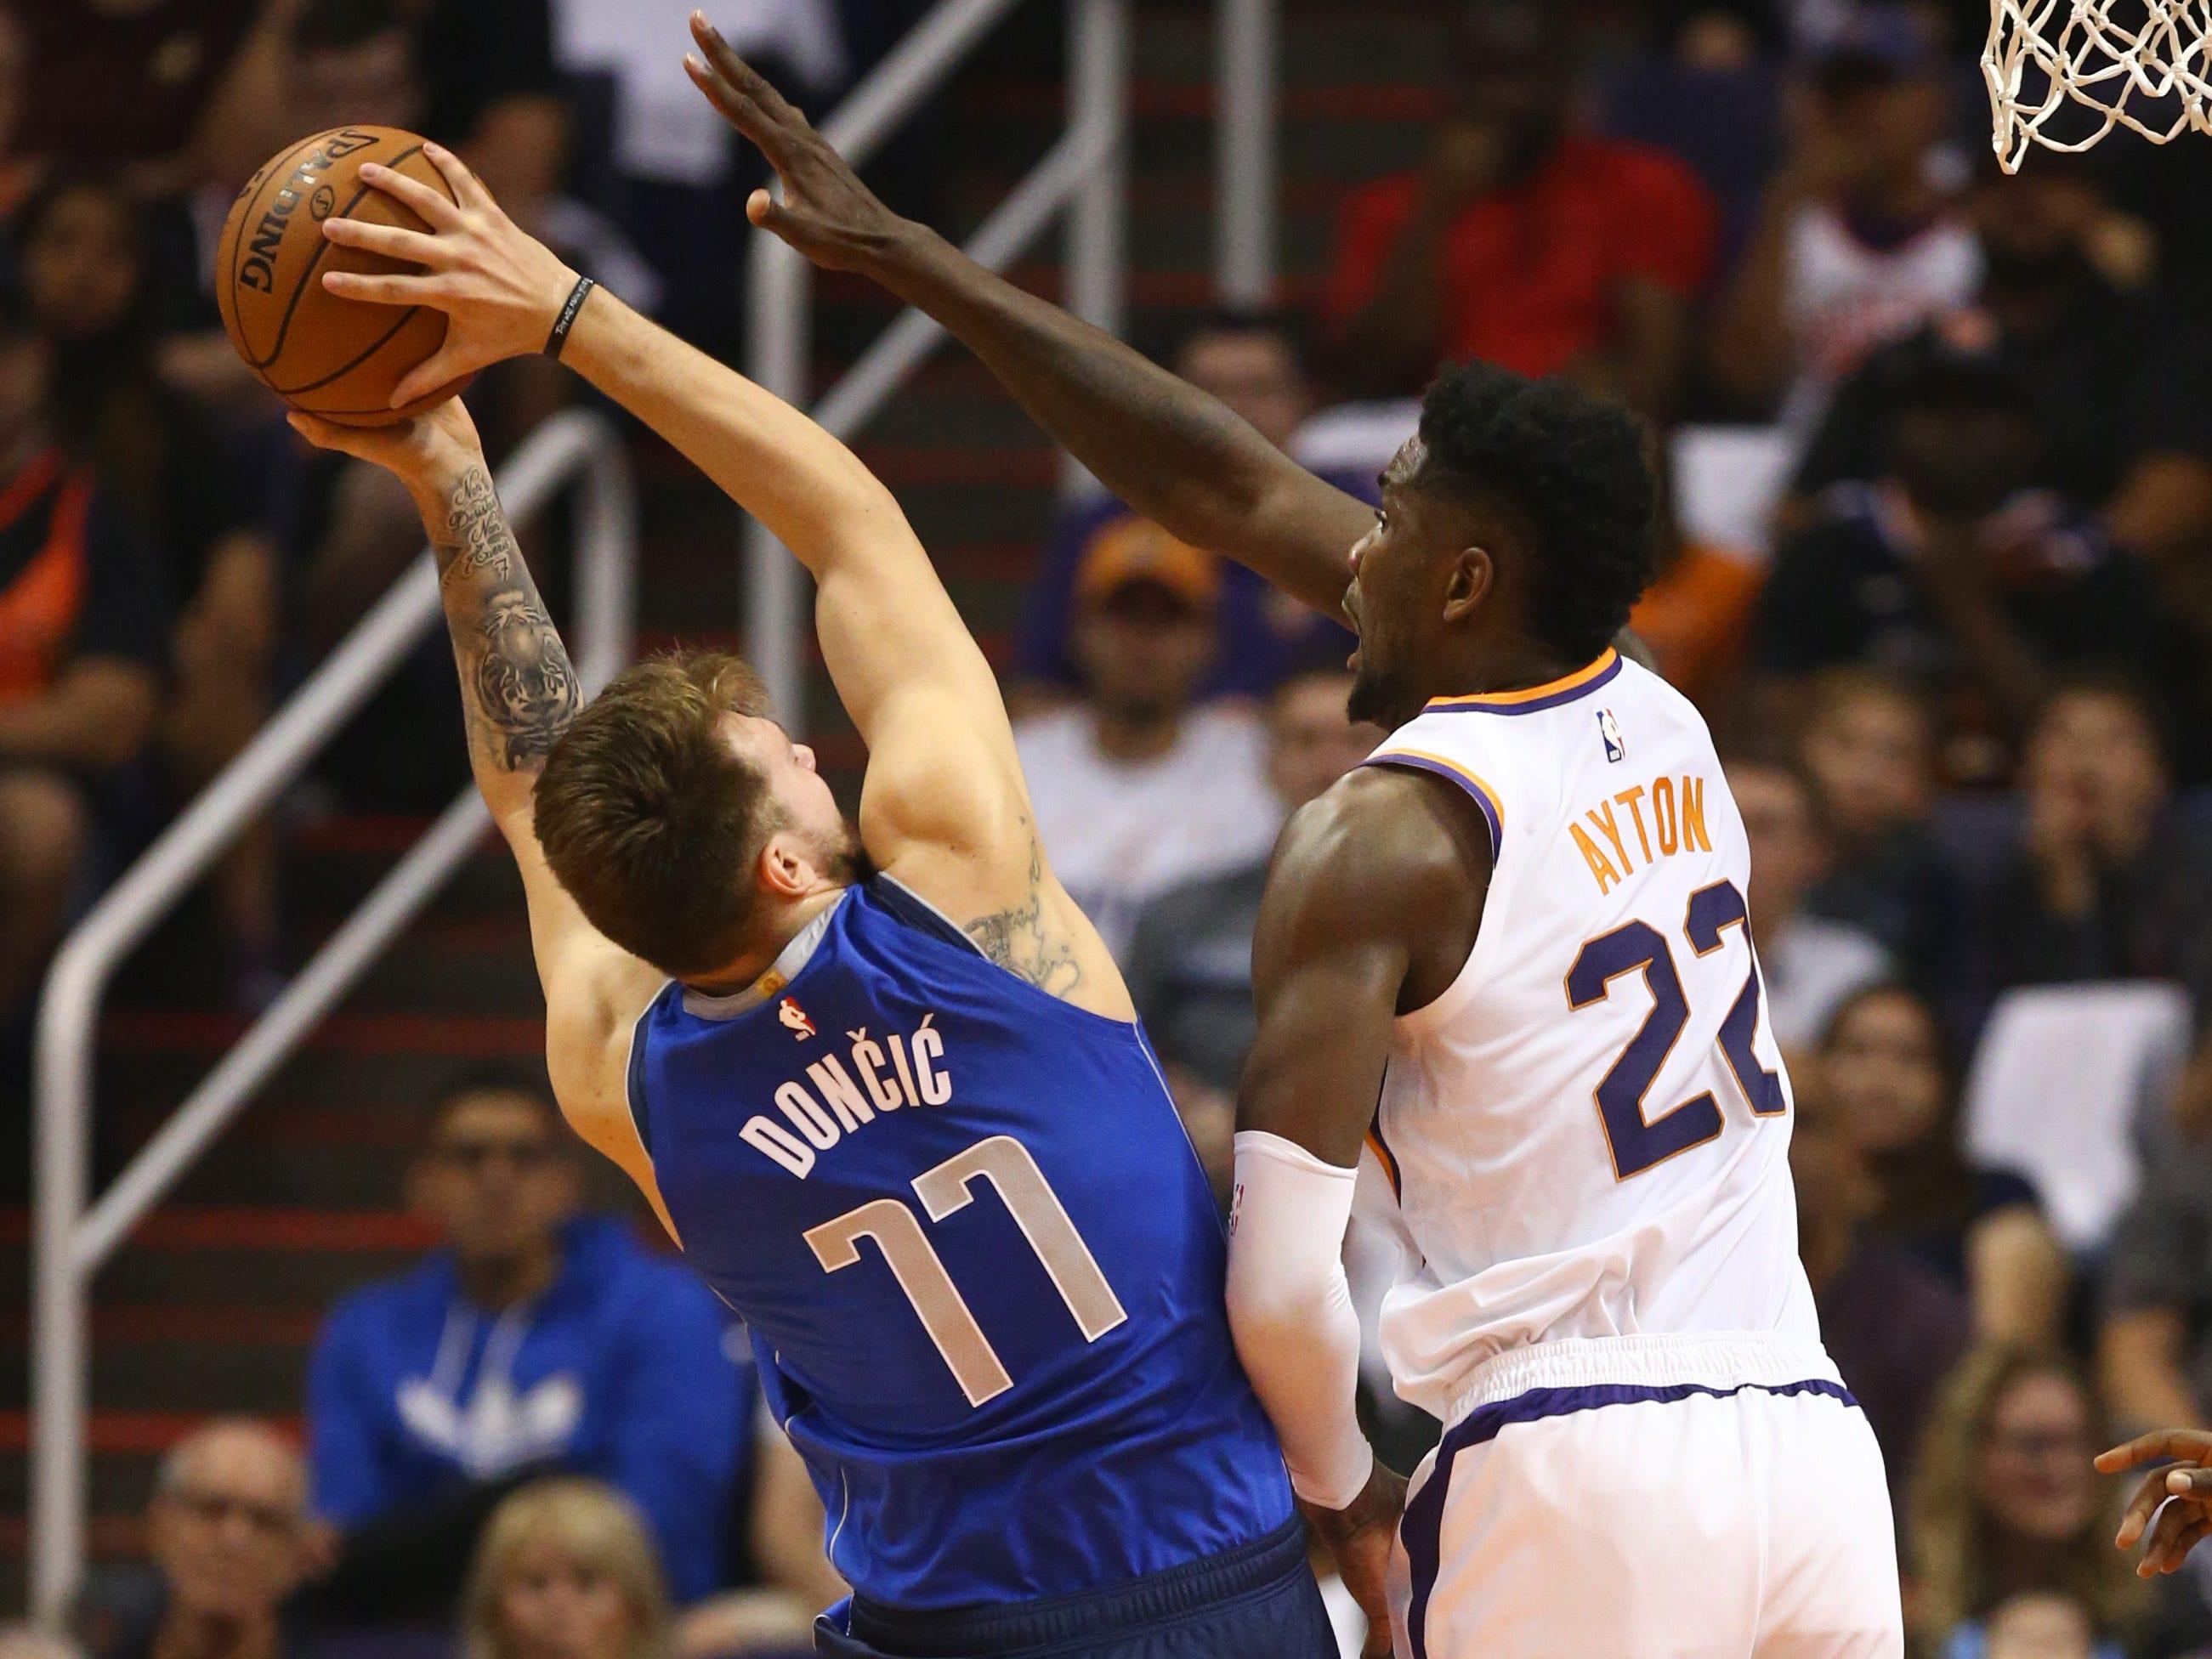 Phoenix Suns Deandre Ayton guards Dallas Mavericks Luka Doncic during the season opener at Talking Stick Resort Arena on Oct. 17, 2018, in Phoenix, Ariz.